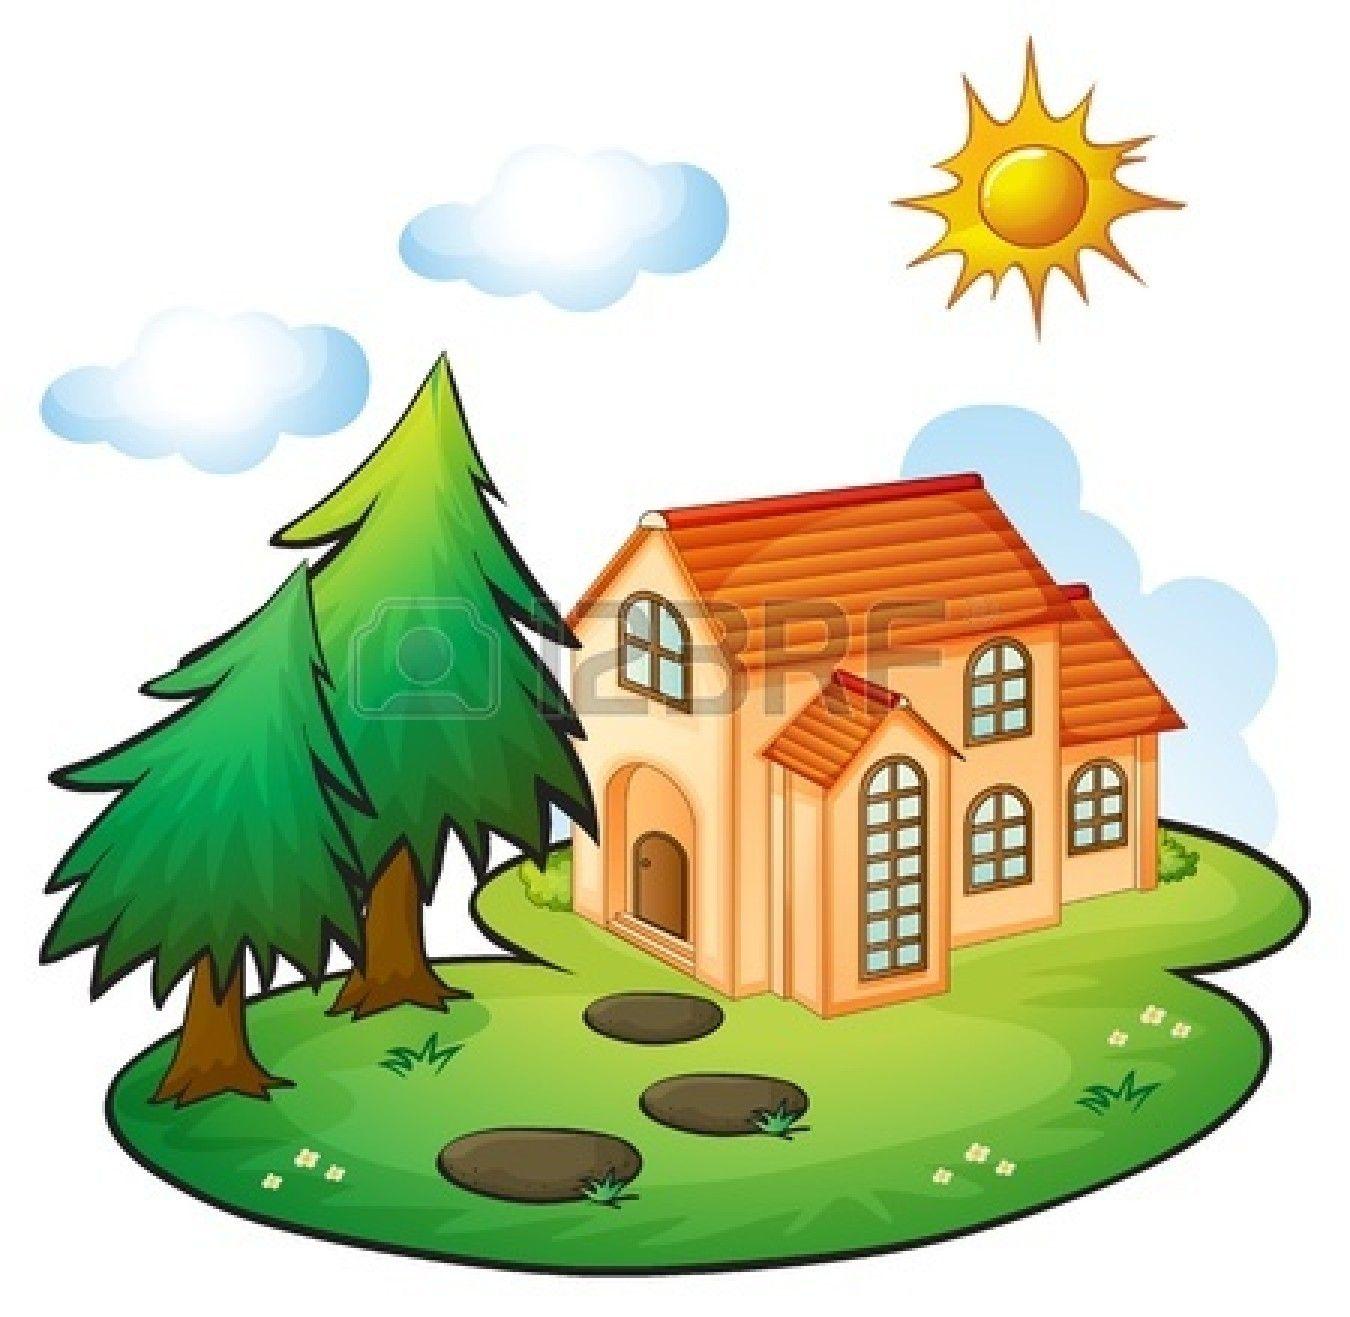 cute house clipart - Google Search | Cute house, Vintage ...